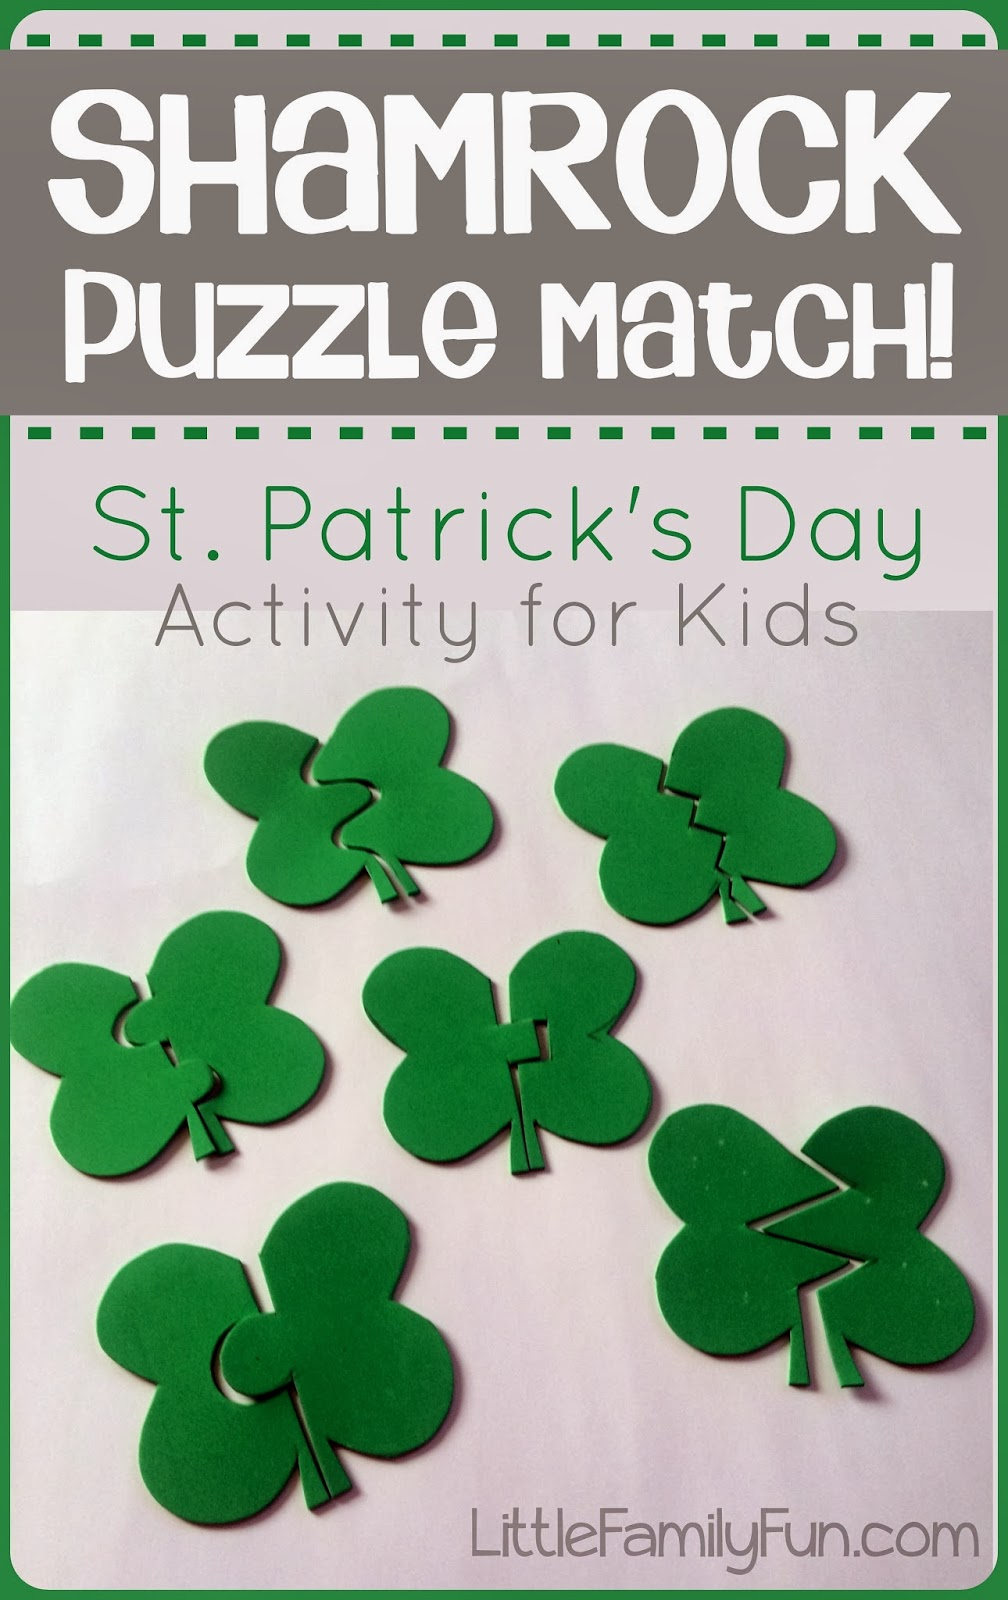 http://www.littlefamilyfun.com/2014/03/shamrock-puzzle-match-st-patricks-day.html